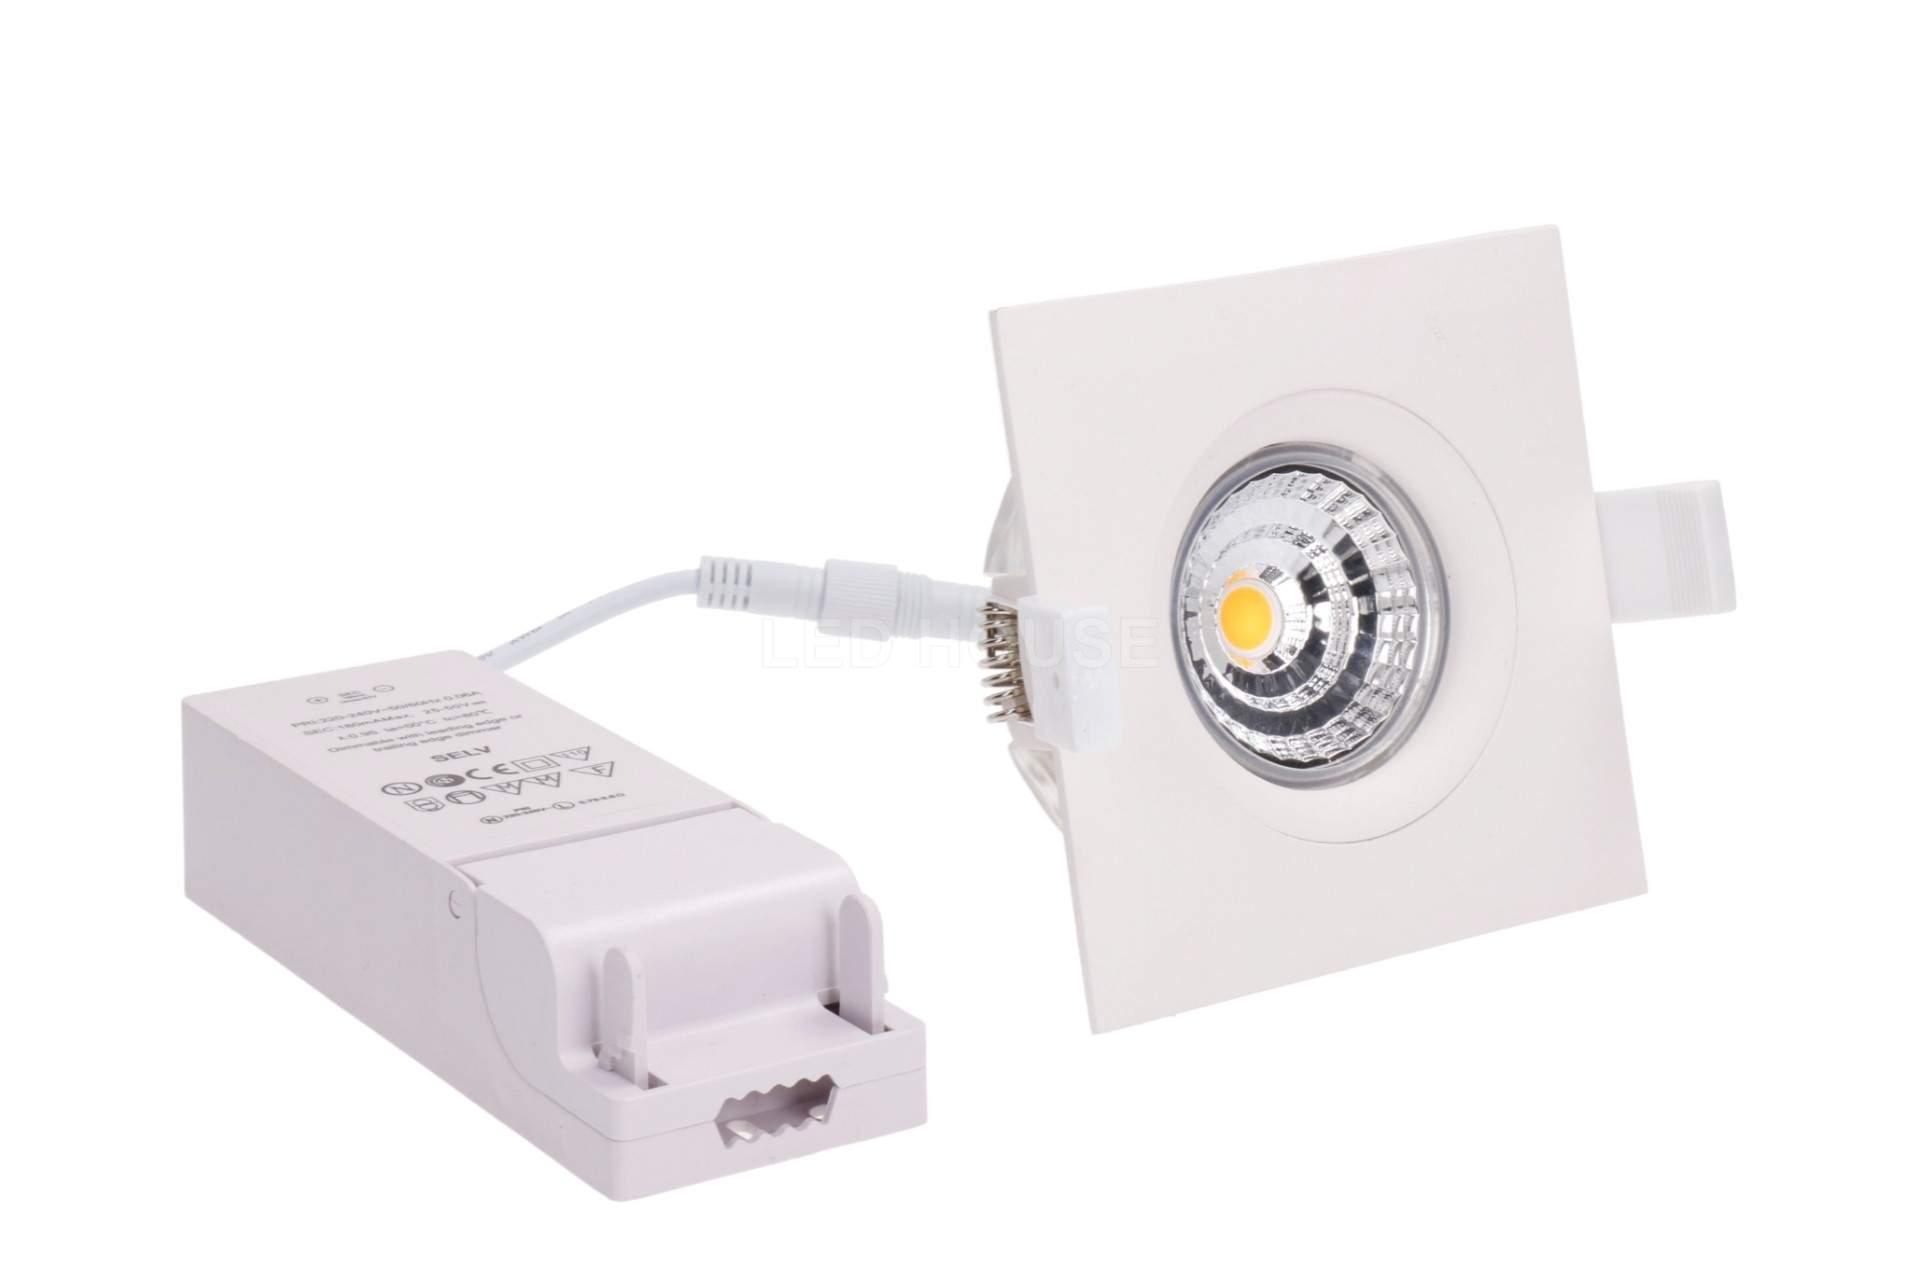 LED downlight LED downlight PROLUMEN Smart Plus 9WFS DIM white square 9W 720lm CRI90  45° IP44 3000K warm white